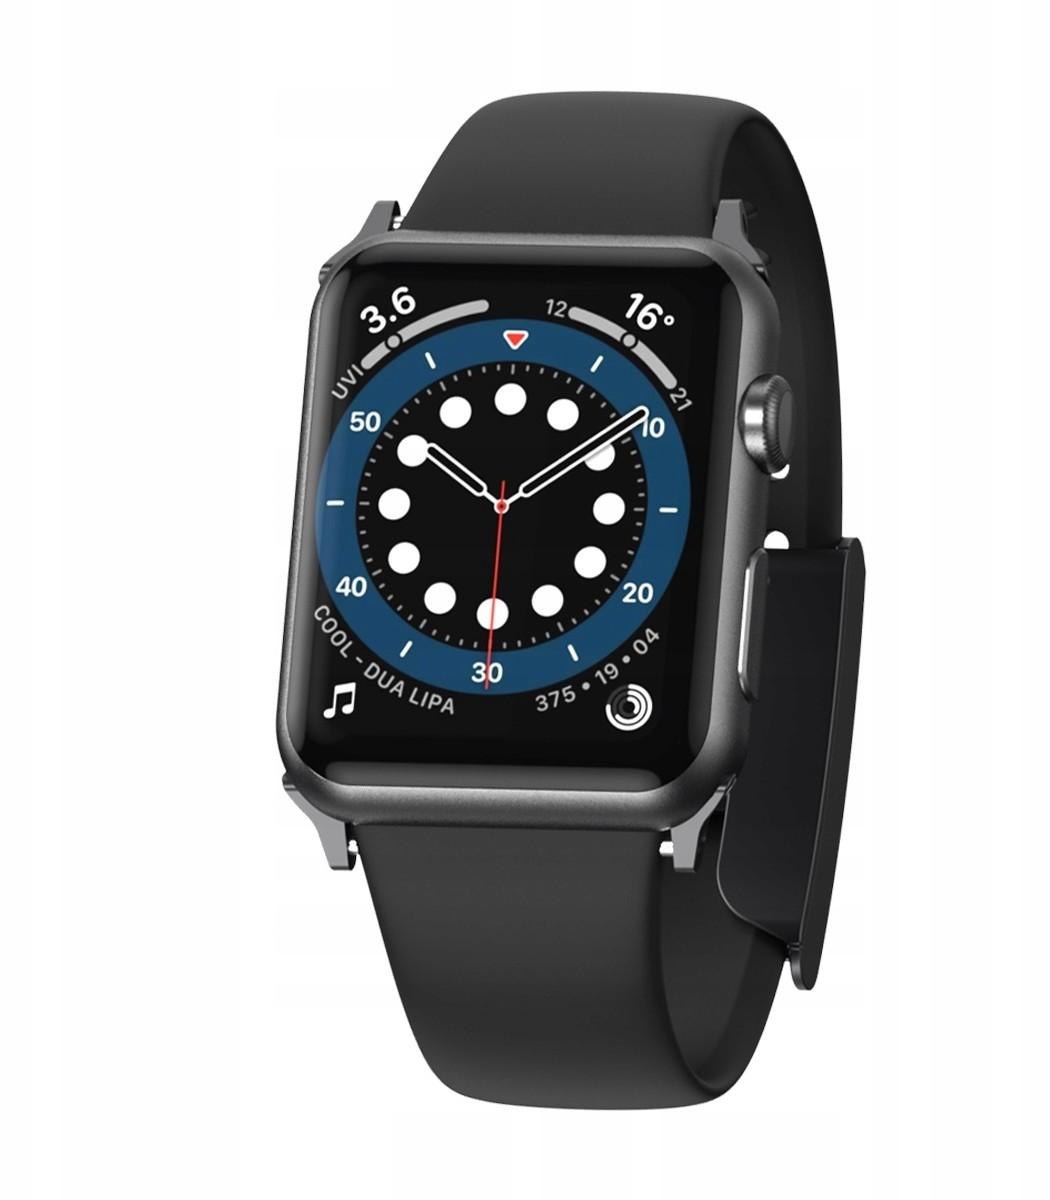 BASEUS Pasek Do Apple Watch 3 4 5 6 Se 42 44mm